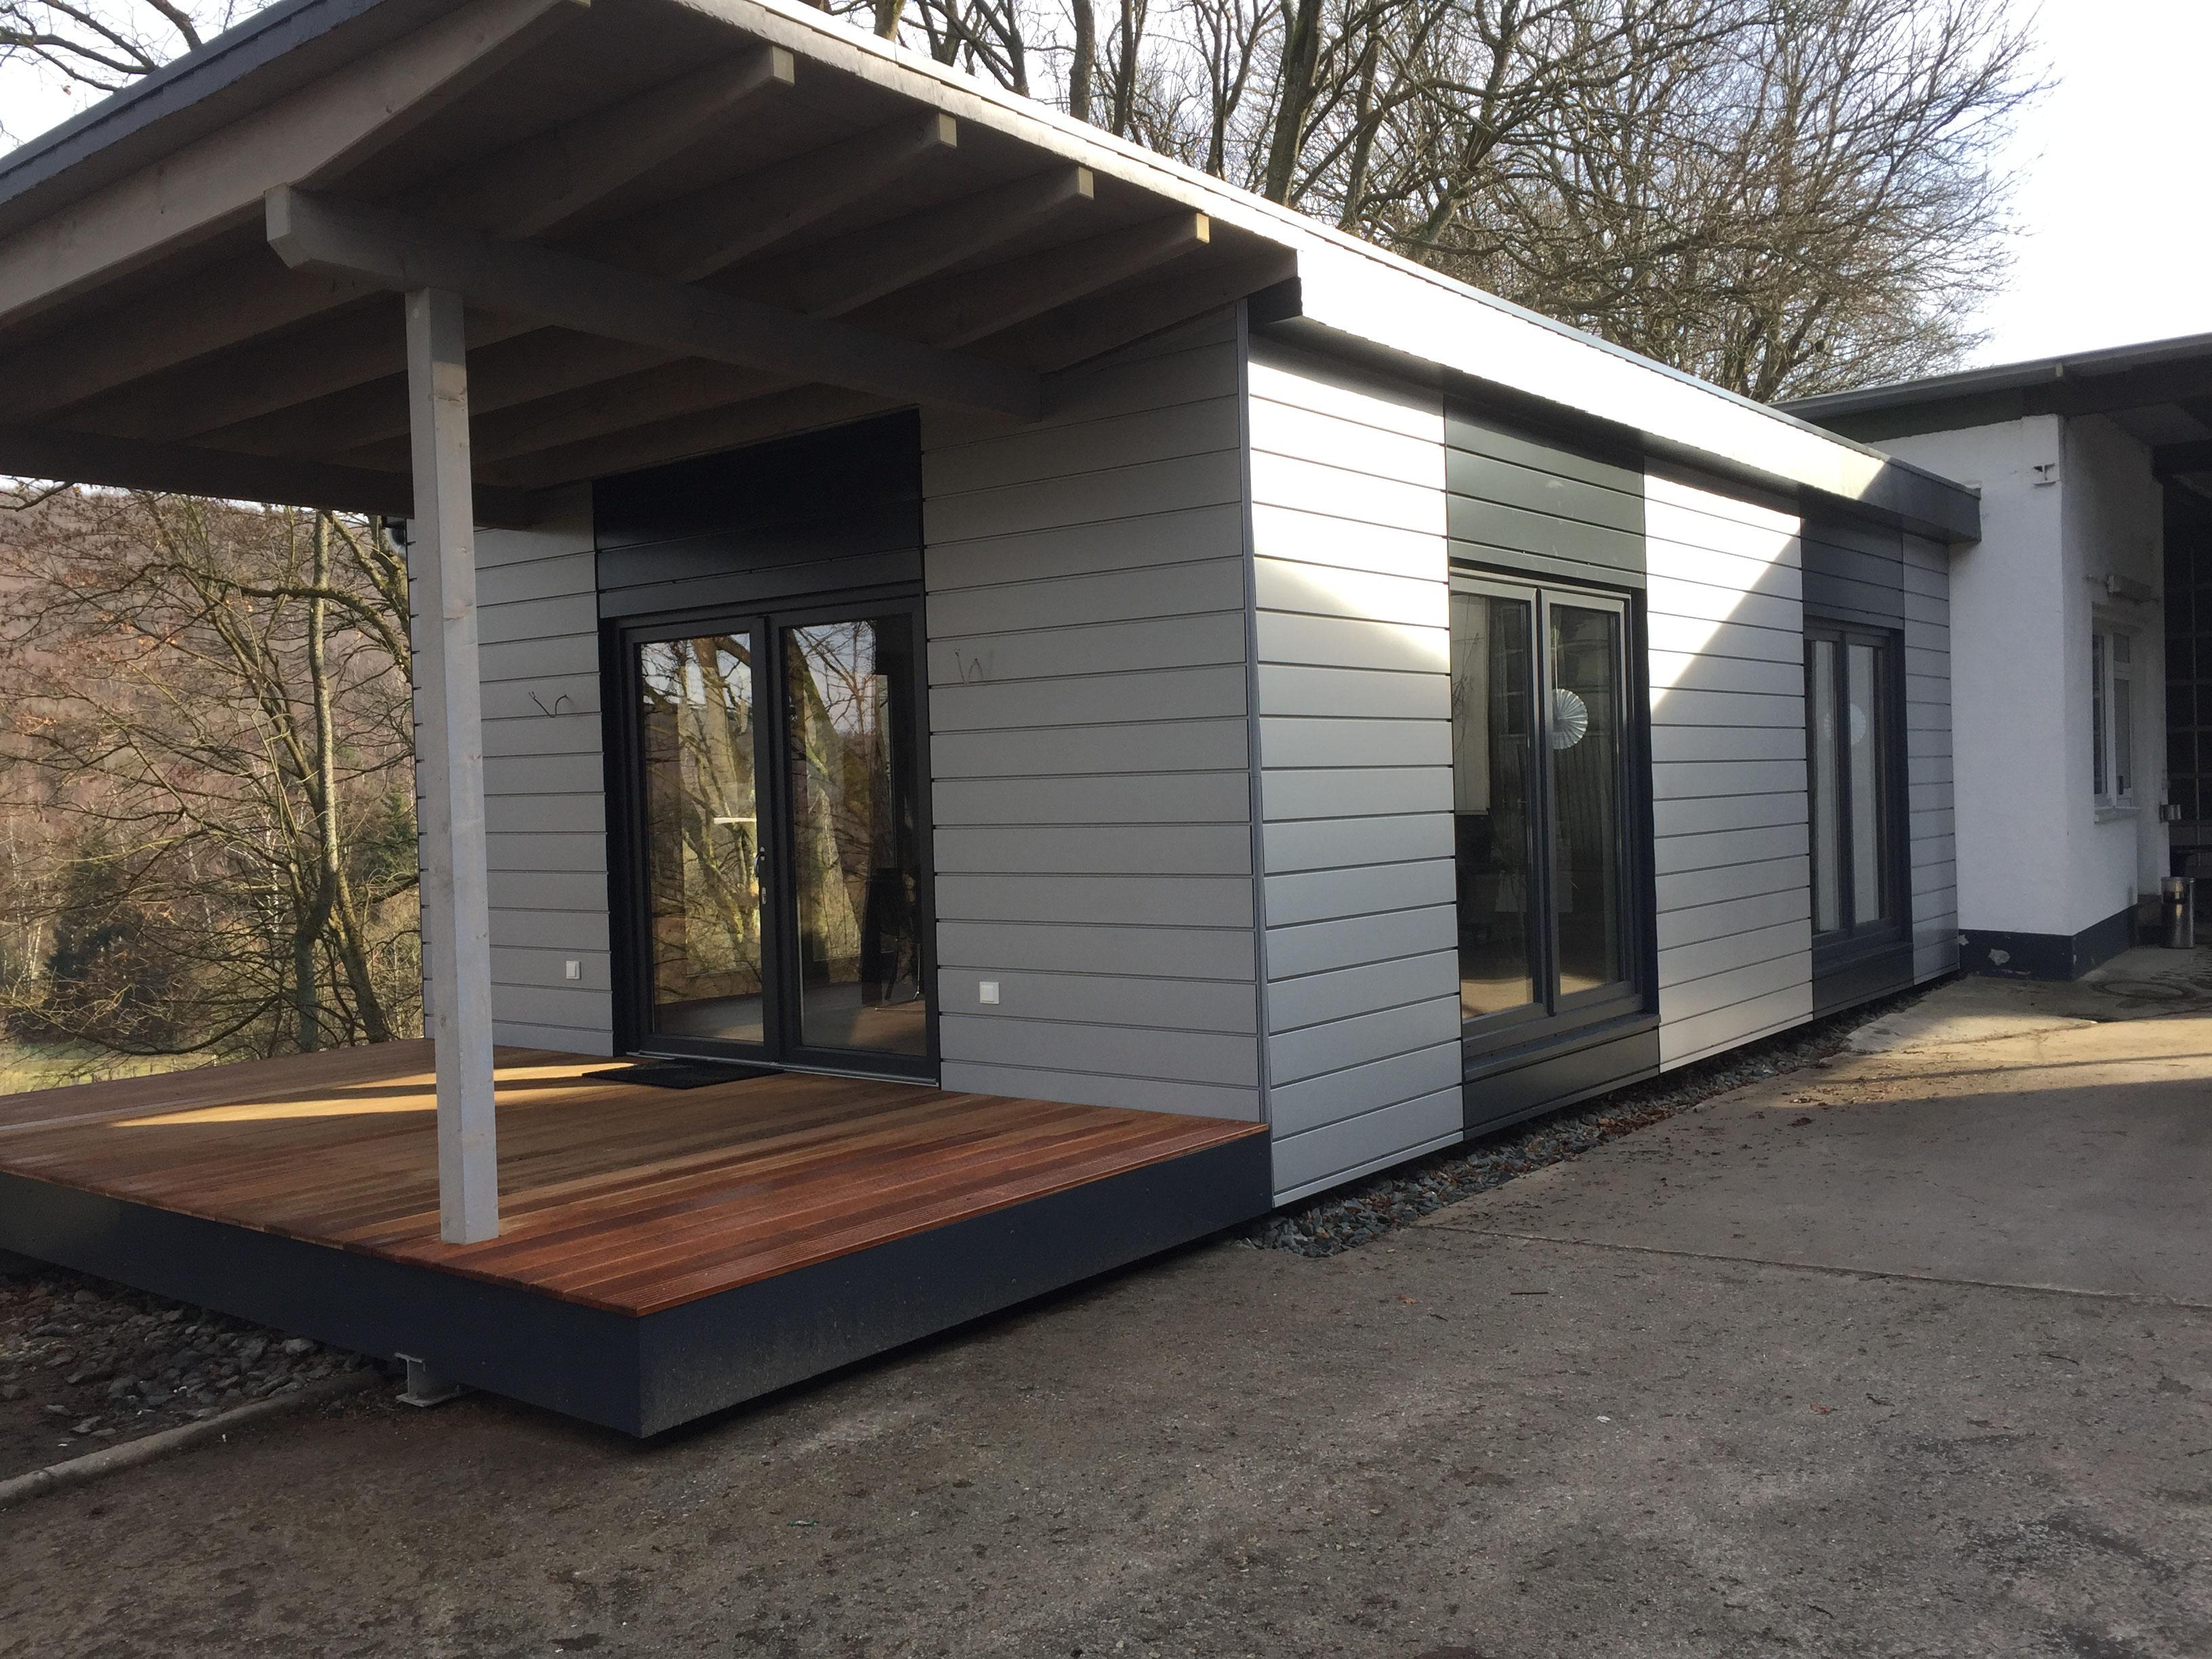 Pausenraum in Holzrahmenbau erstellt. Moderner Anbau in Holzbauweise ...